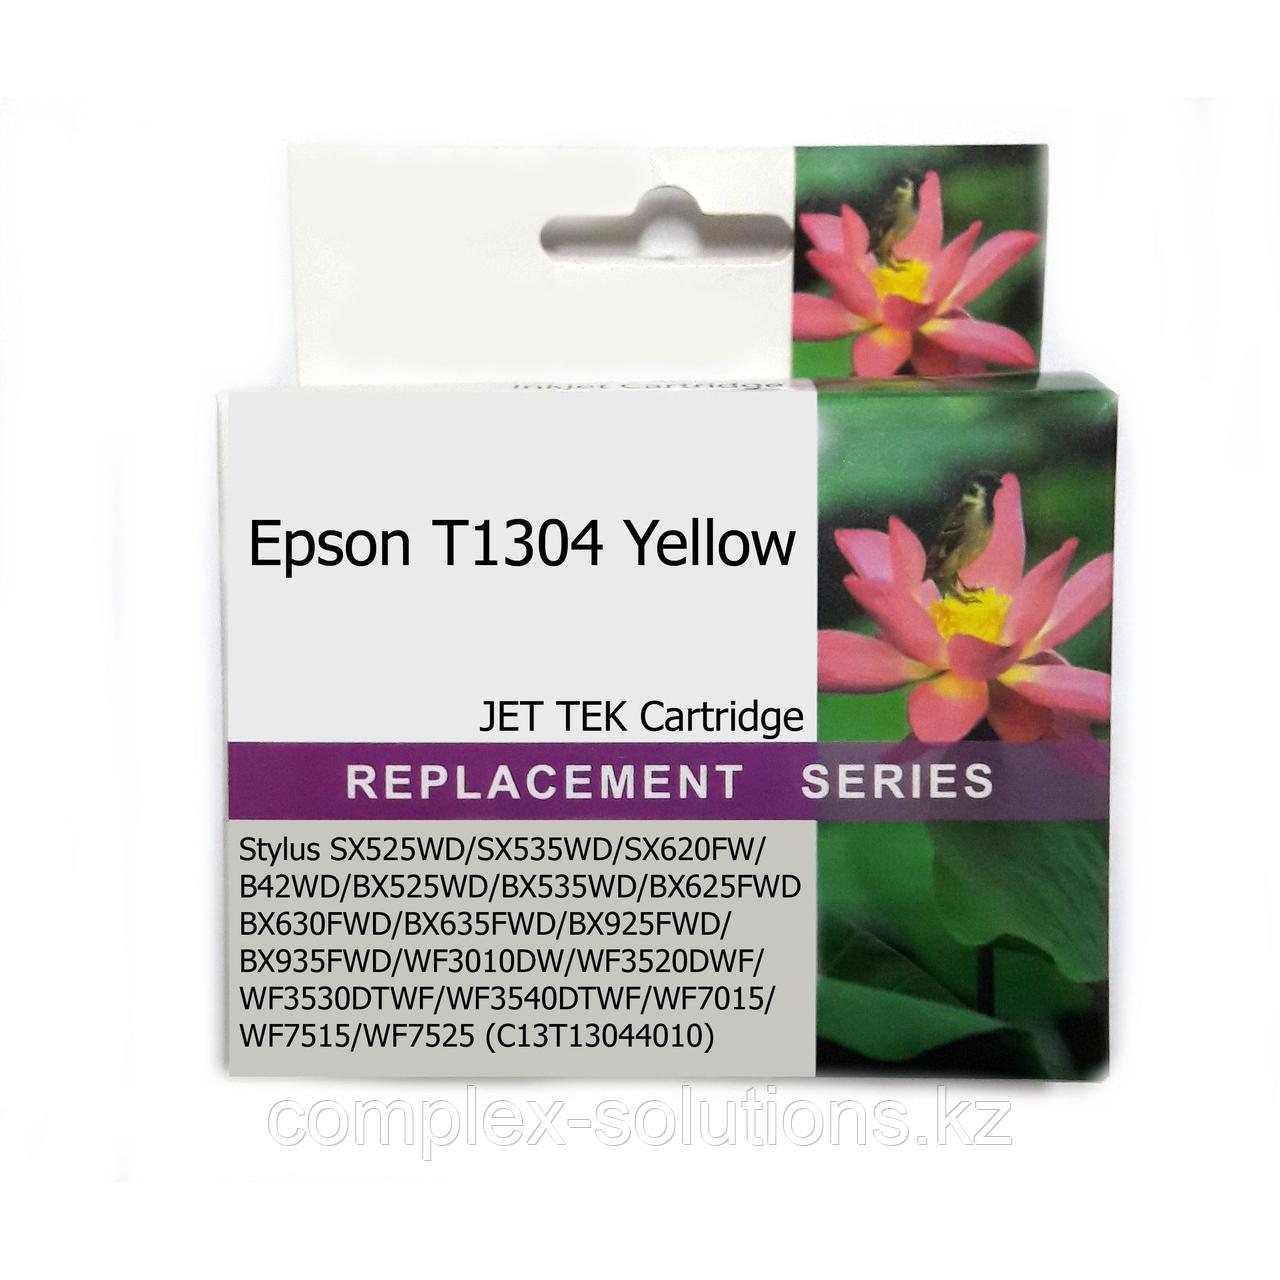 Картридж EPSON T1304 Yellow JET TEK | [качественный дубликат]